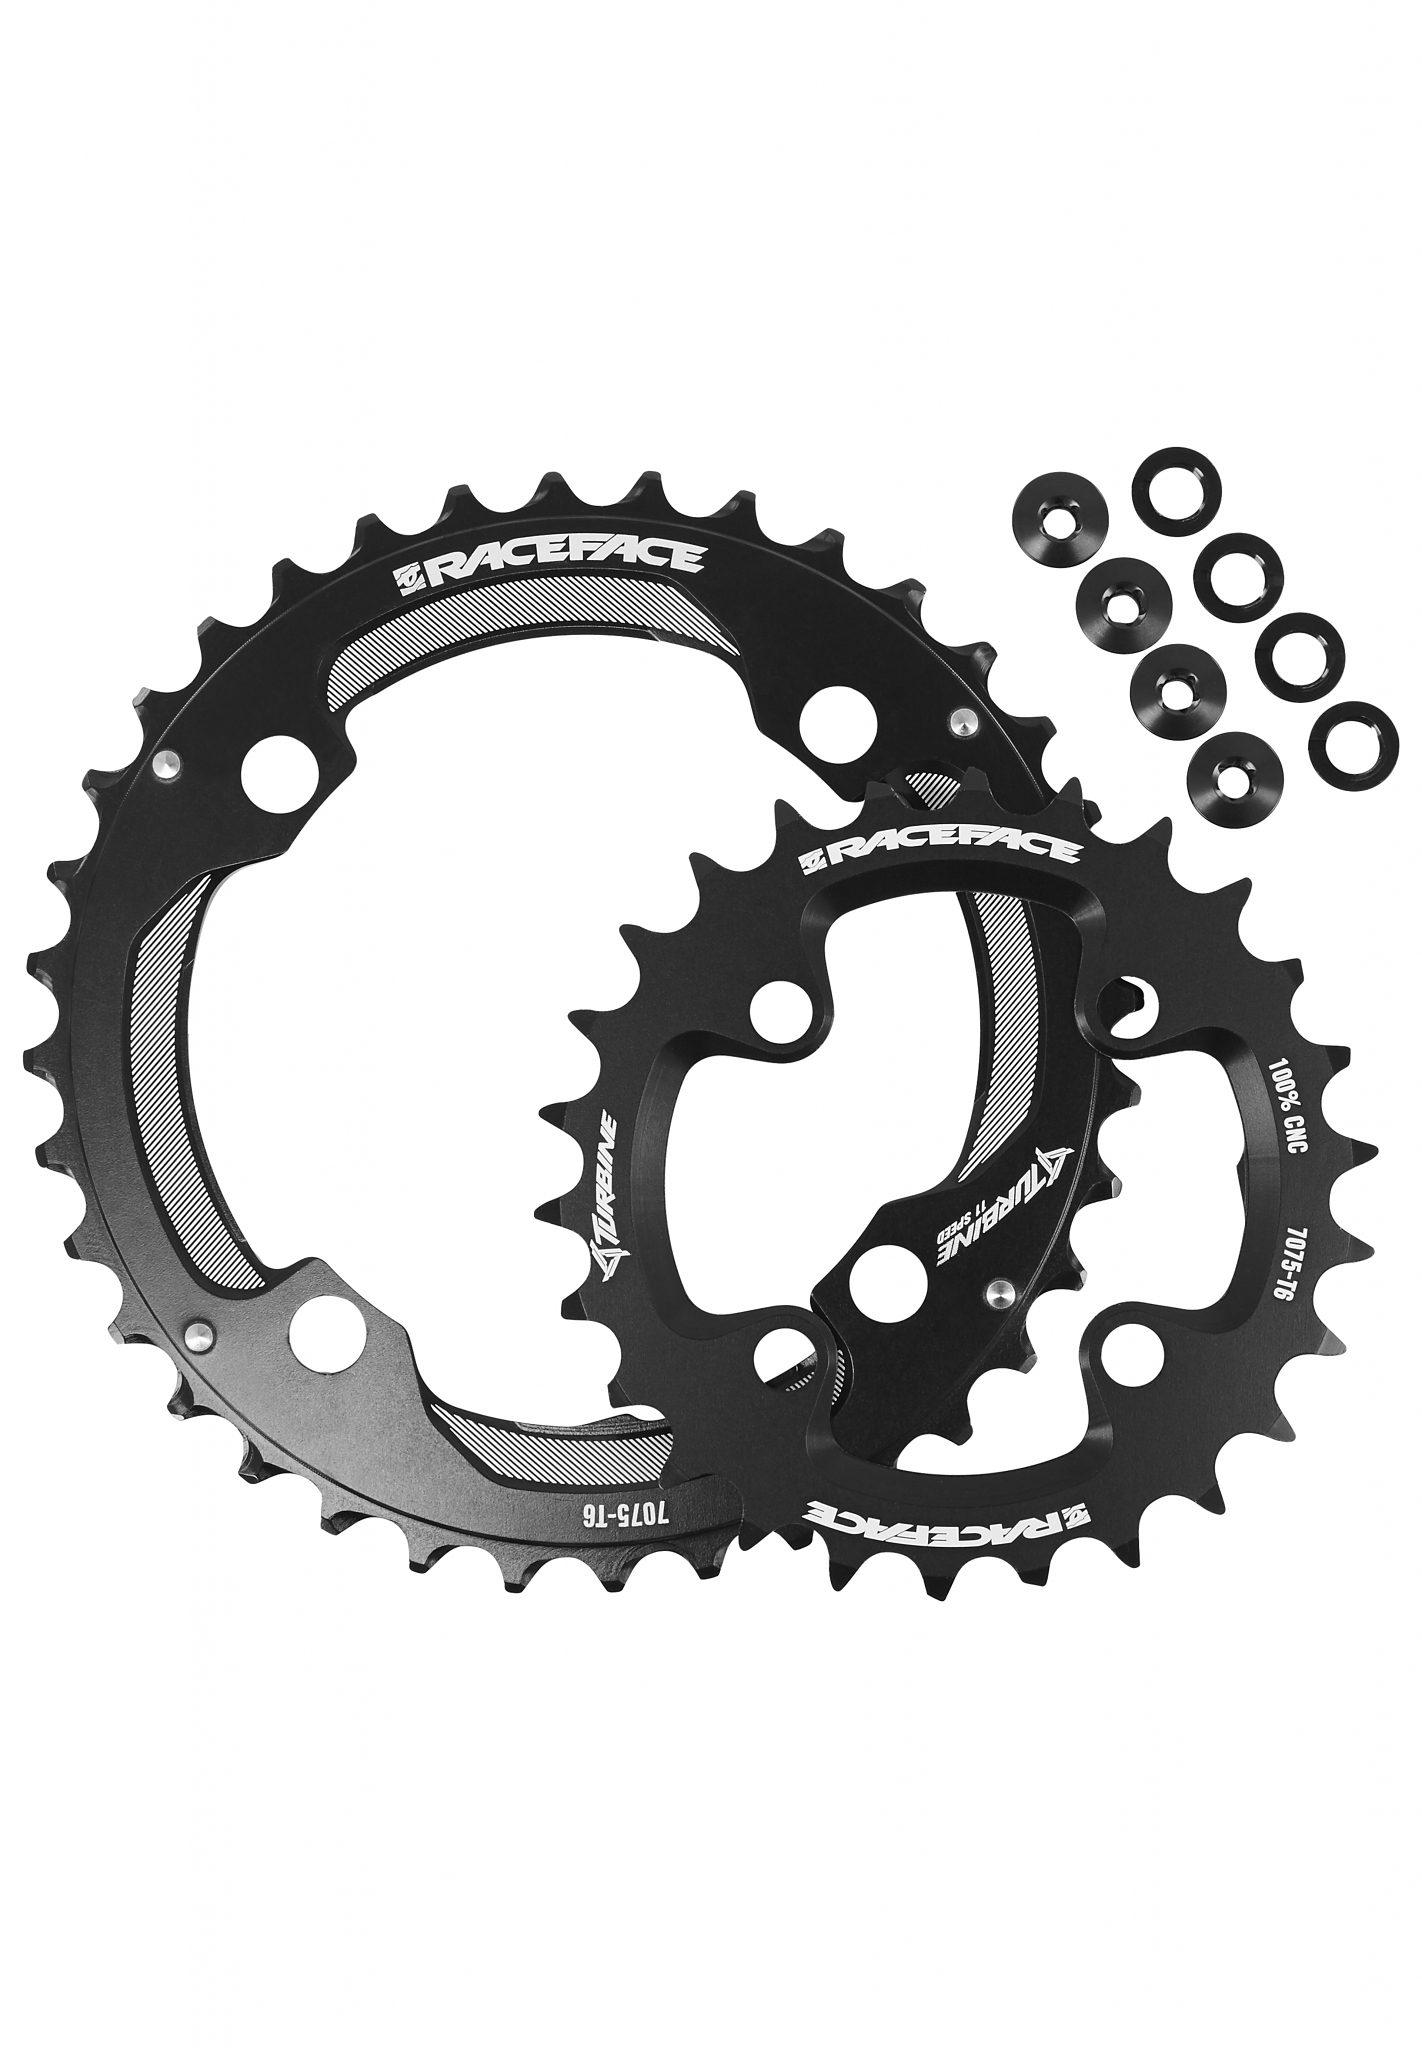 Race Face Kettenblatt »Turbine Chainring Set 4 Bolt 26/36 2x11 Speed«